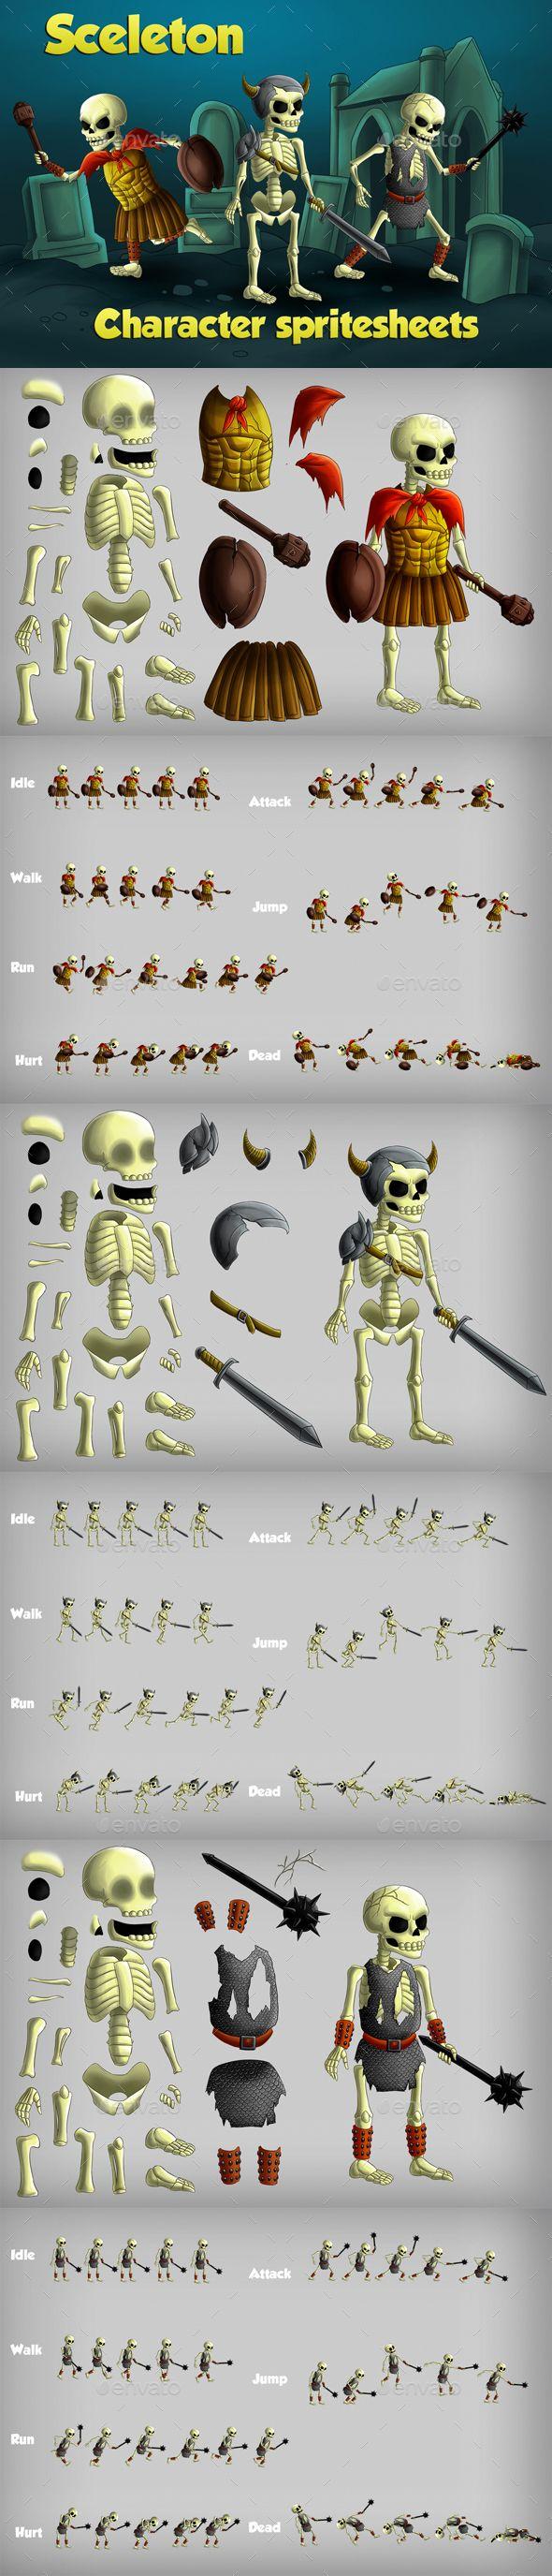 #2D Game Skeleton Character Spritesheet Template - #Game #Skeleton #Sheet #Character #Sprites #Game #Assets #Template #Design. Download here: https://graphicriver.net/item/2d-game-skeleton-character-spritesheet/19511373?ref=yinkira